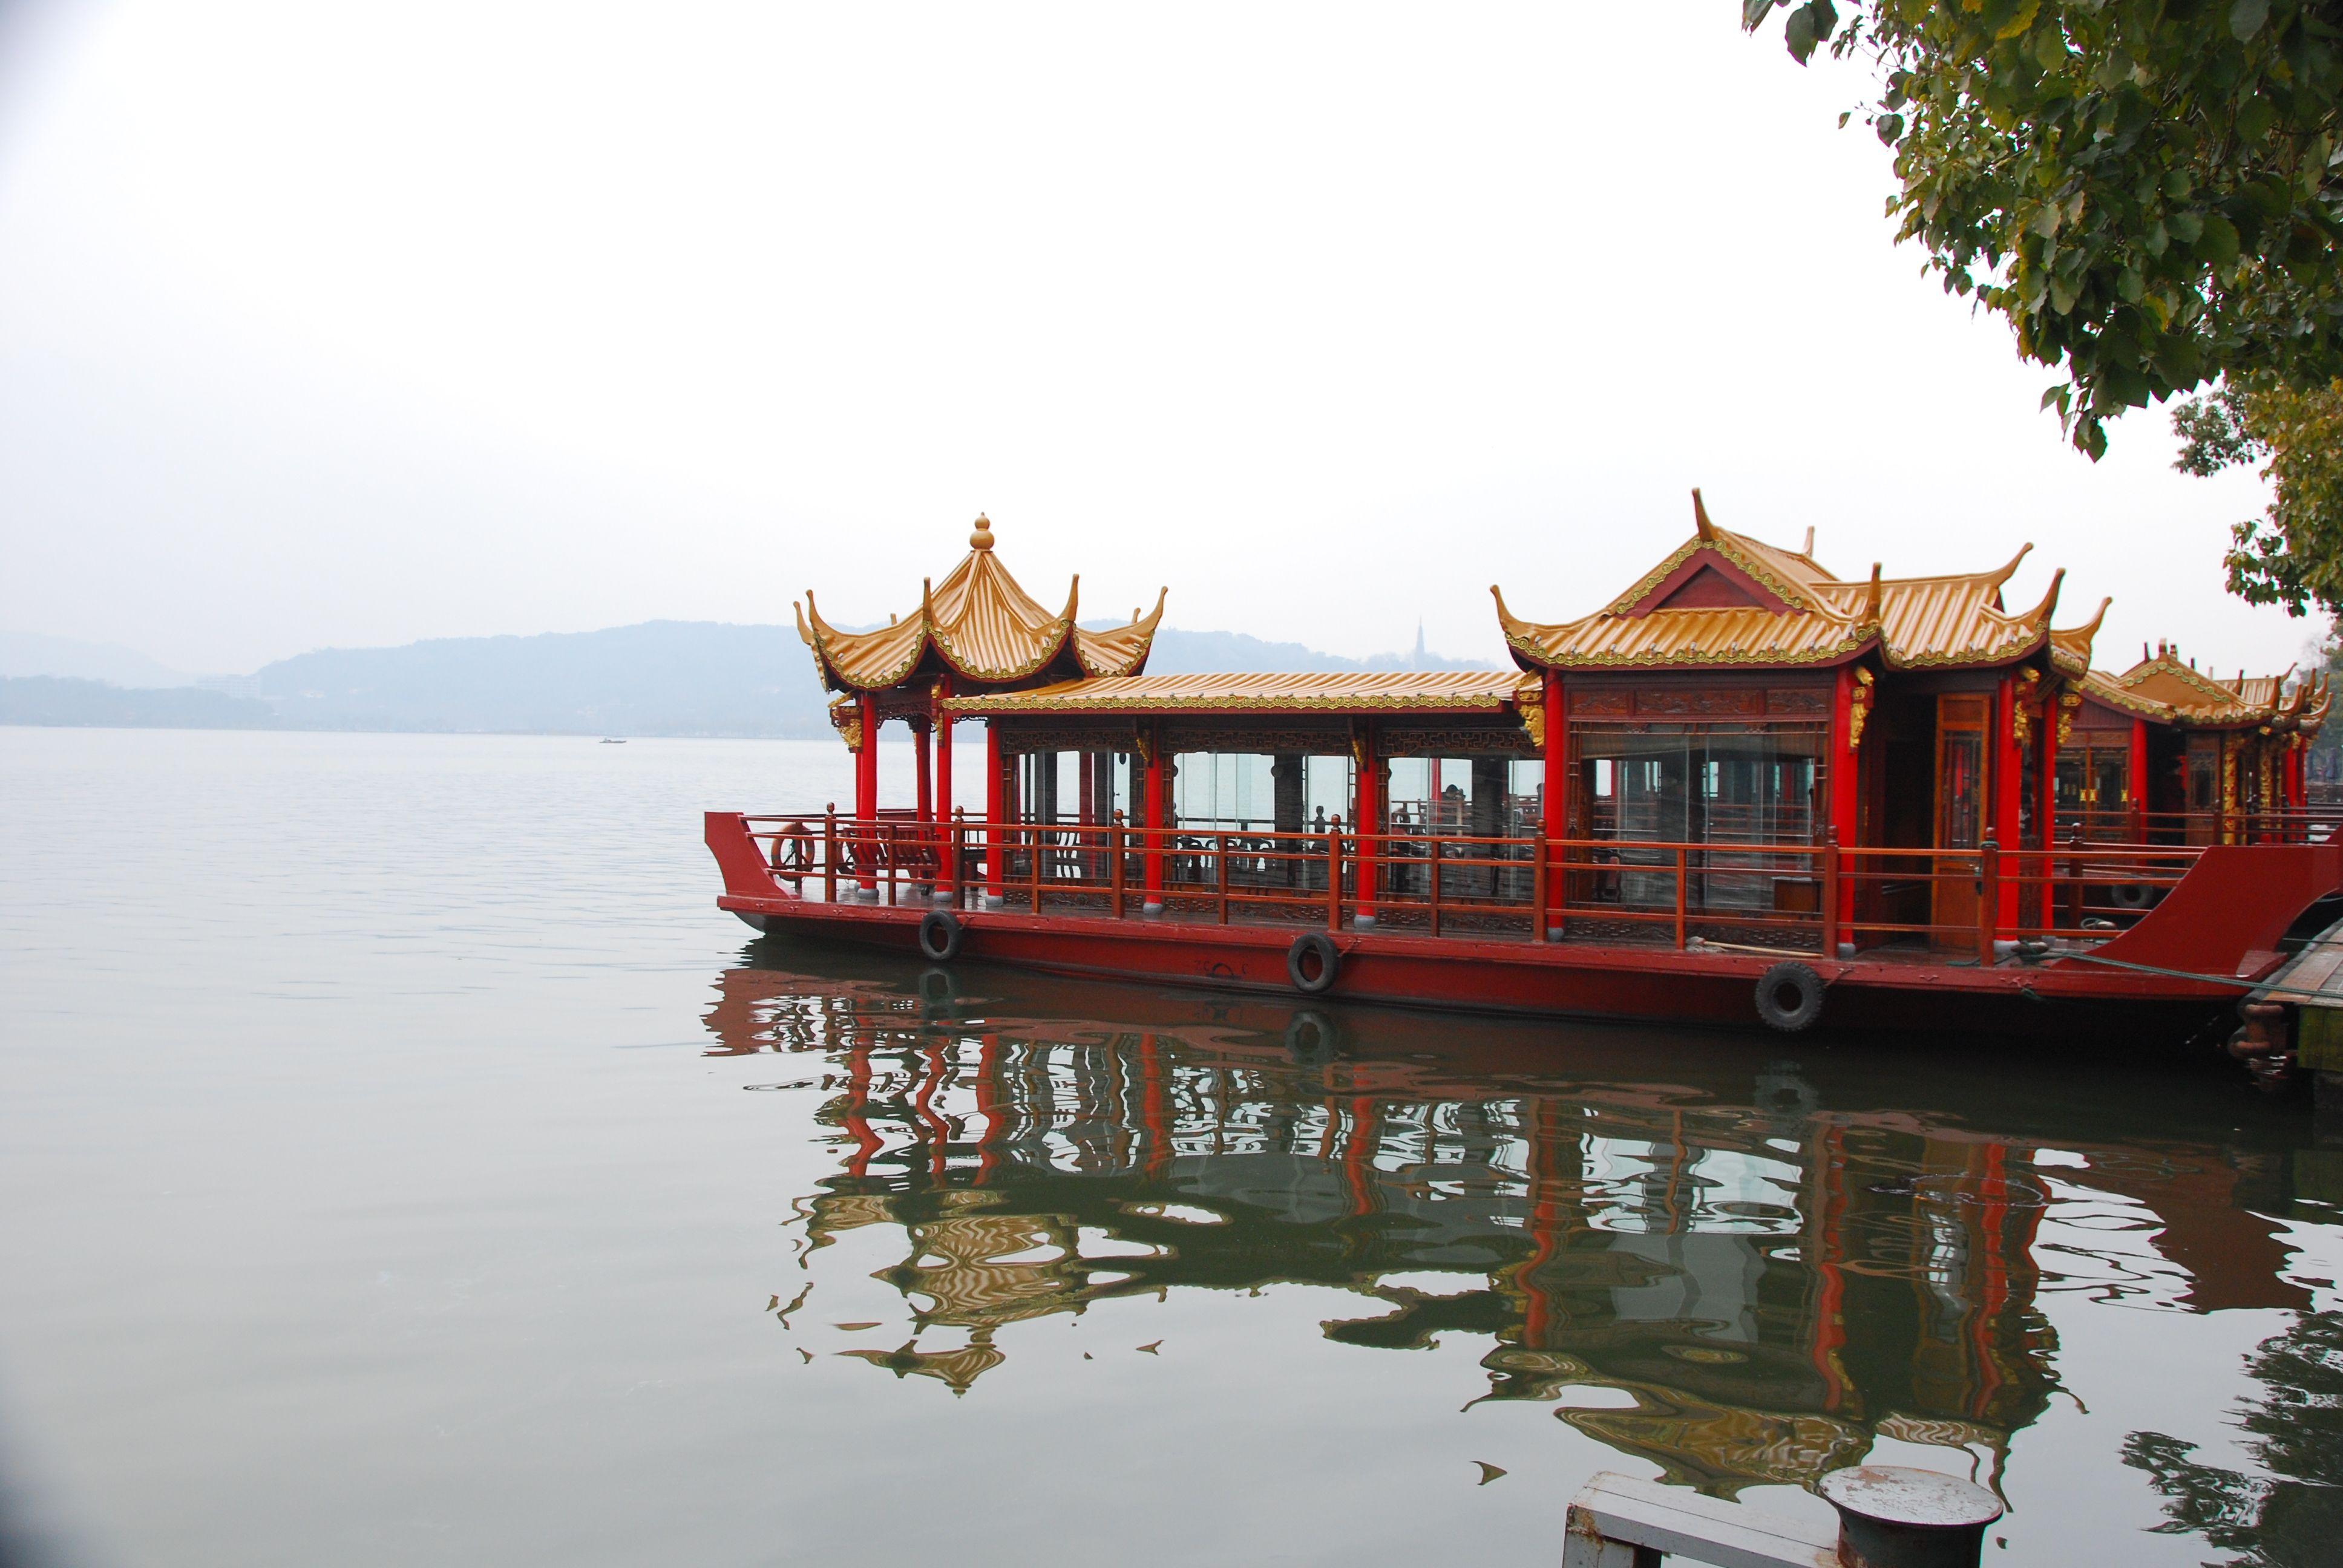 hangzhou_westlake_boat